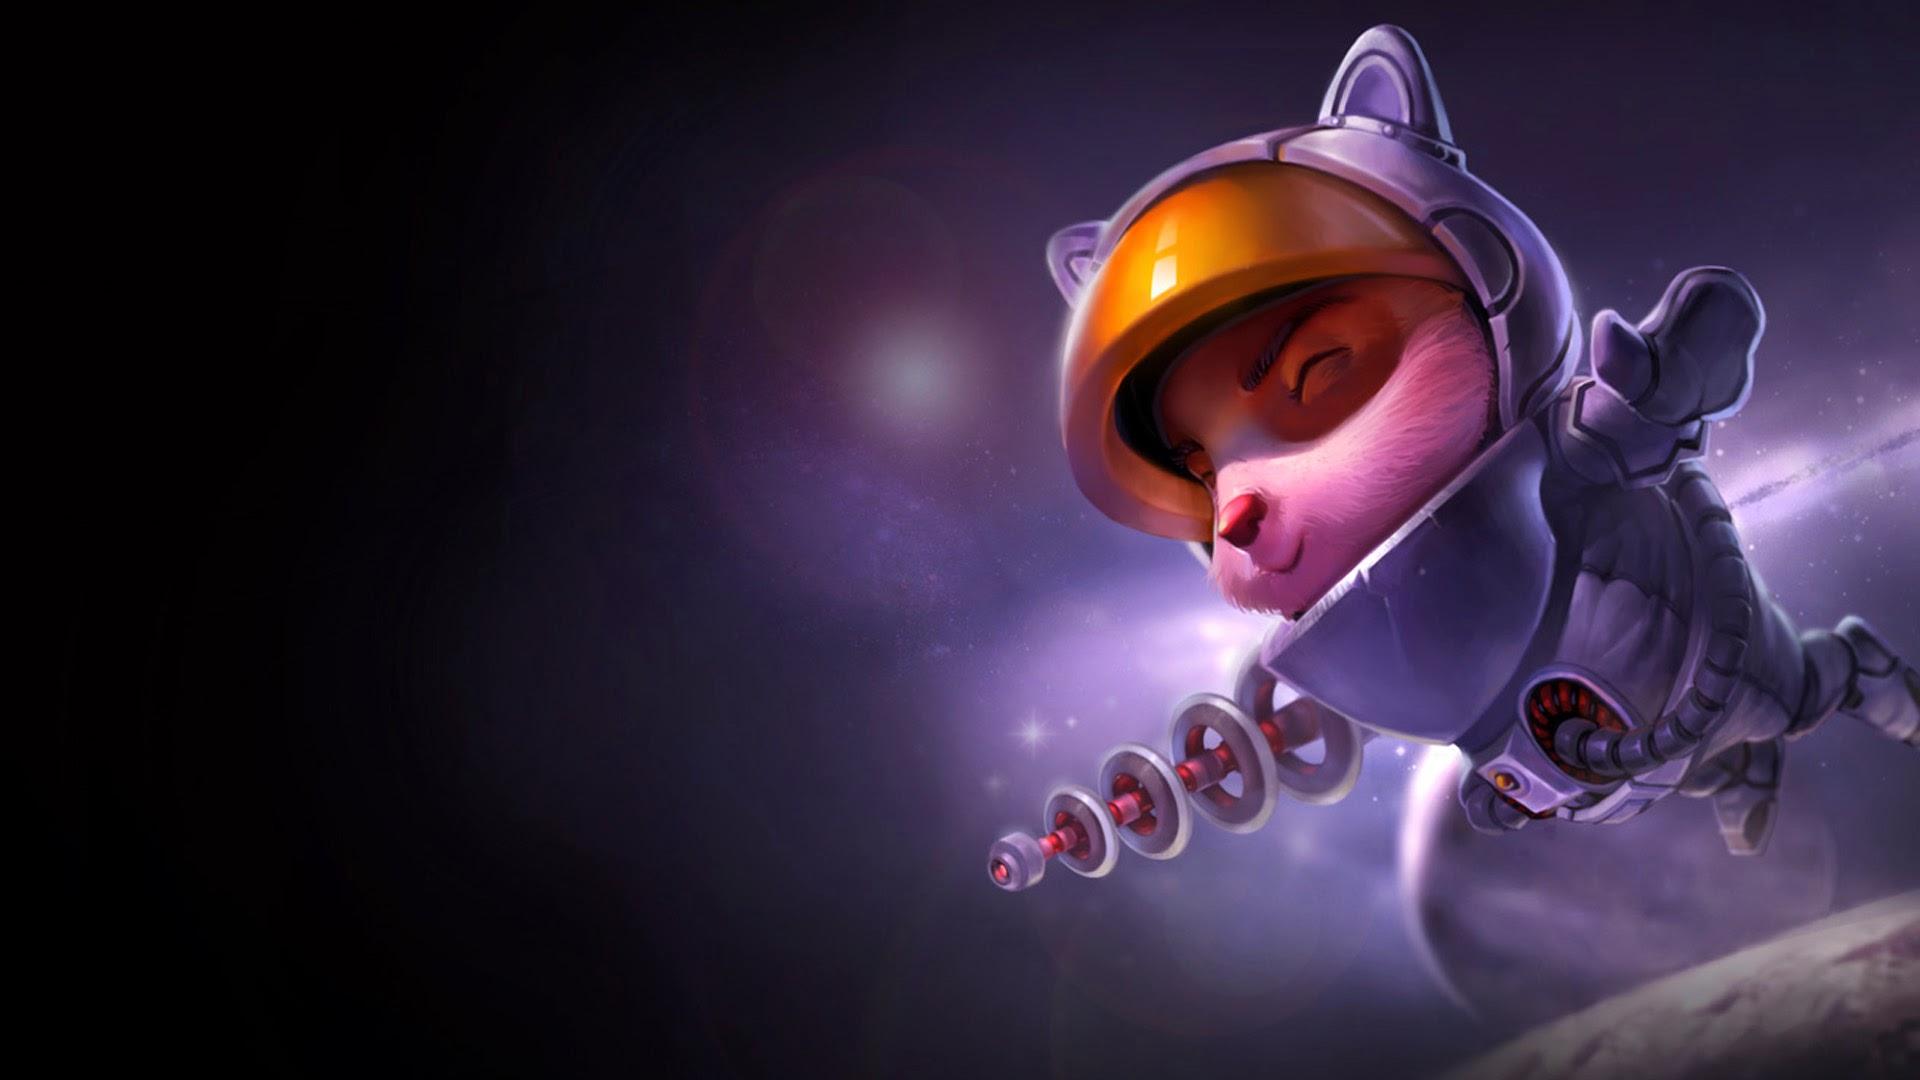 Teemo Astronaut LoL Skin Splash 7i Wallpaper HD